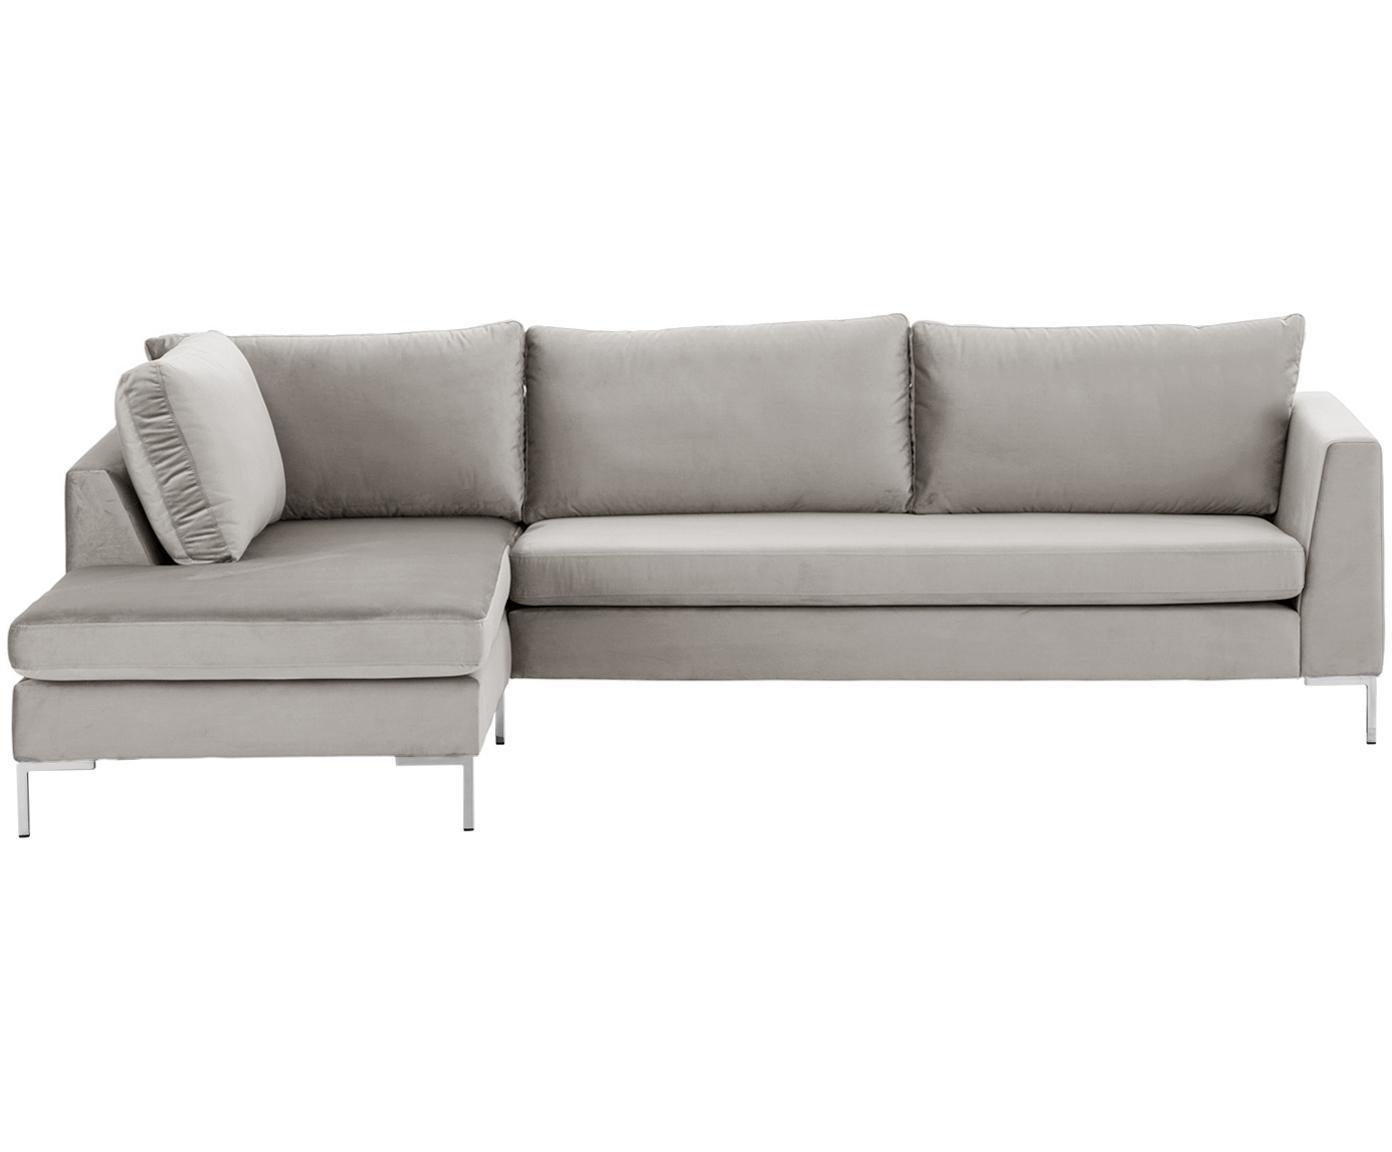 Samt-Ecksofa Luna, Bezug: Samt (Polyester) 80.000 S, Gestell: Massives Buchenholz, Füße: Metall, galvanisiert, Samt Beige, Silber, B 280 x T 184 cm